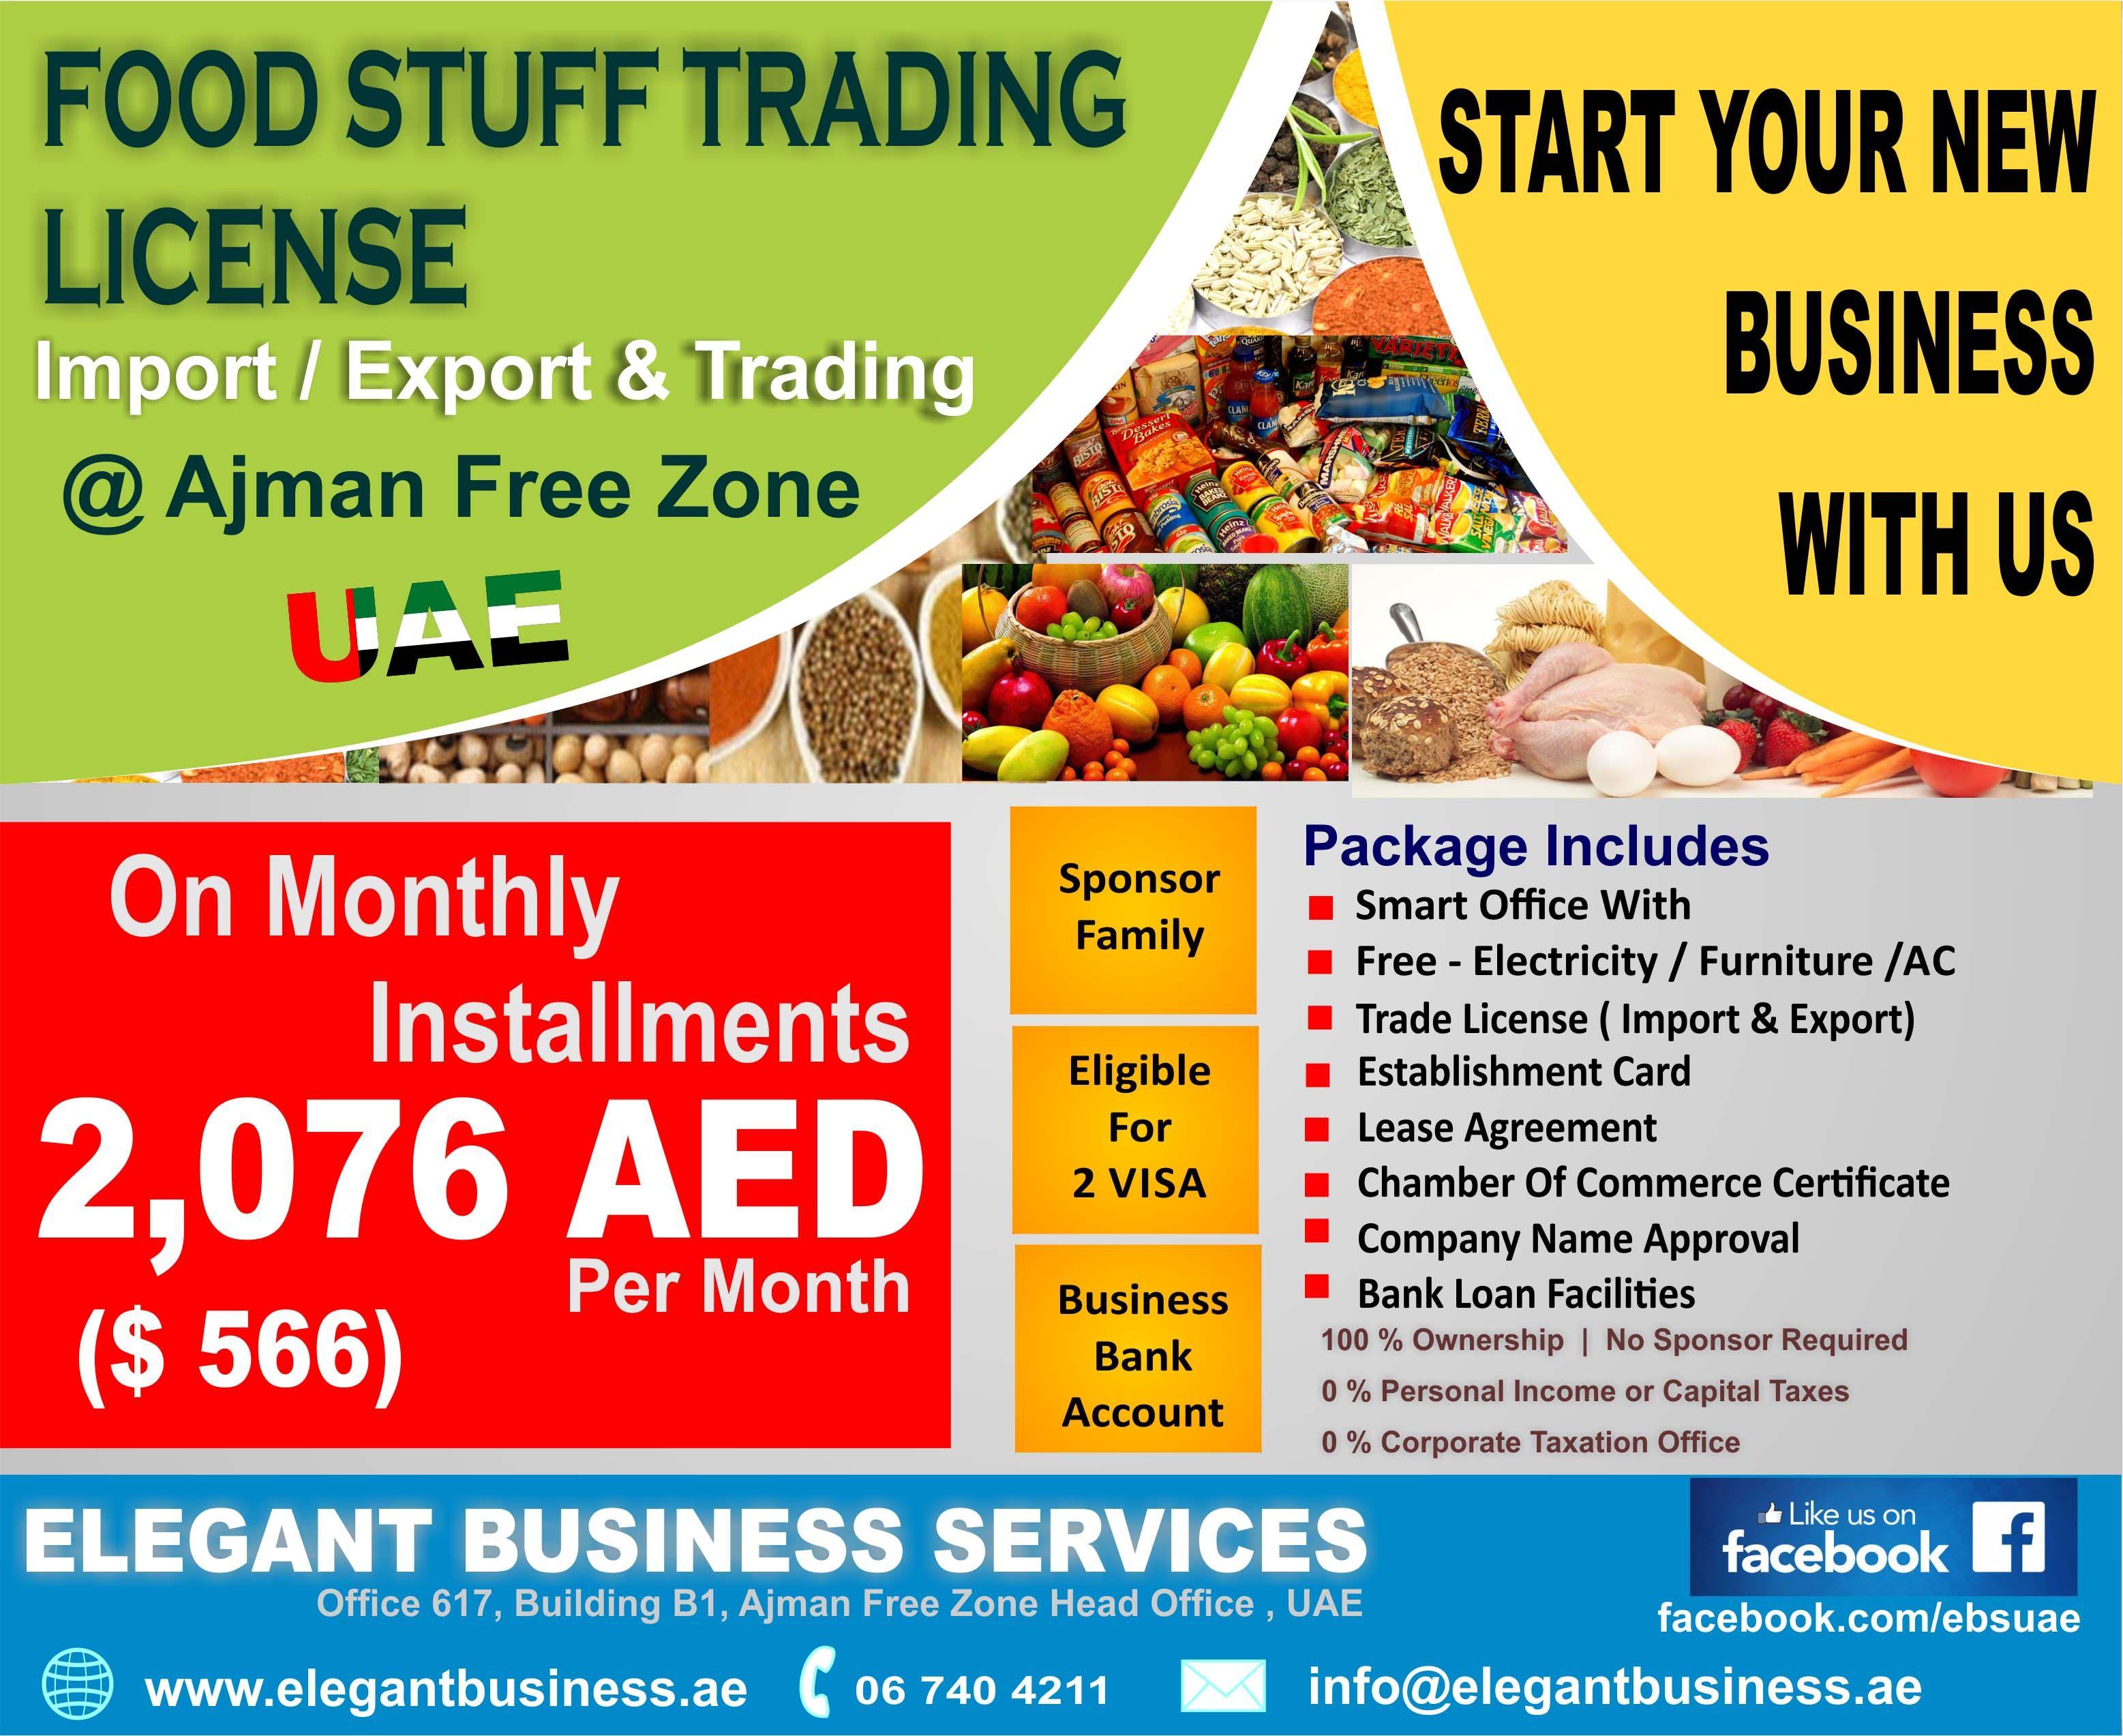 Food Stuff Trading License Ajman Free Zone UAE Elegant